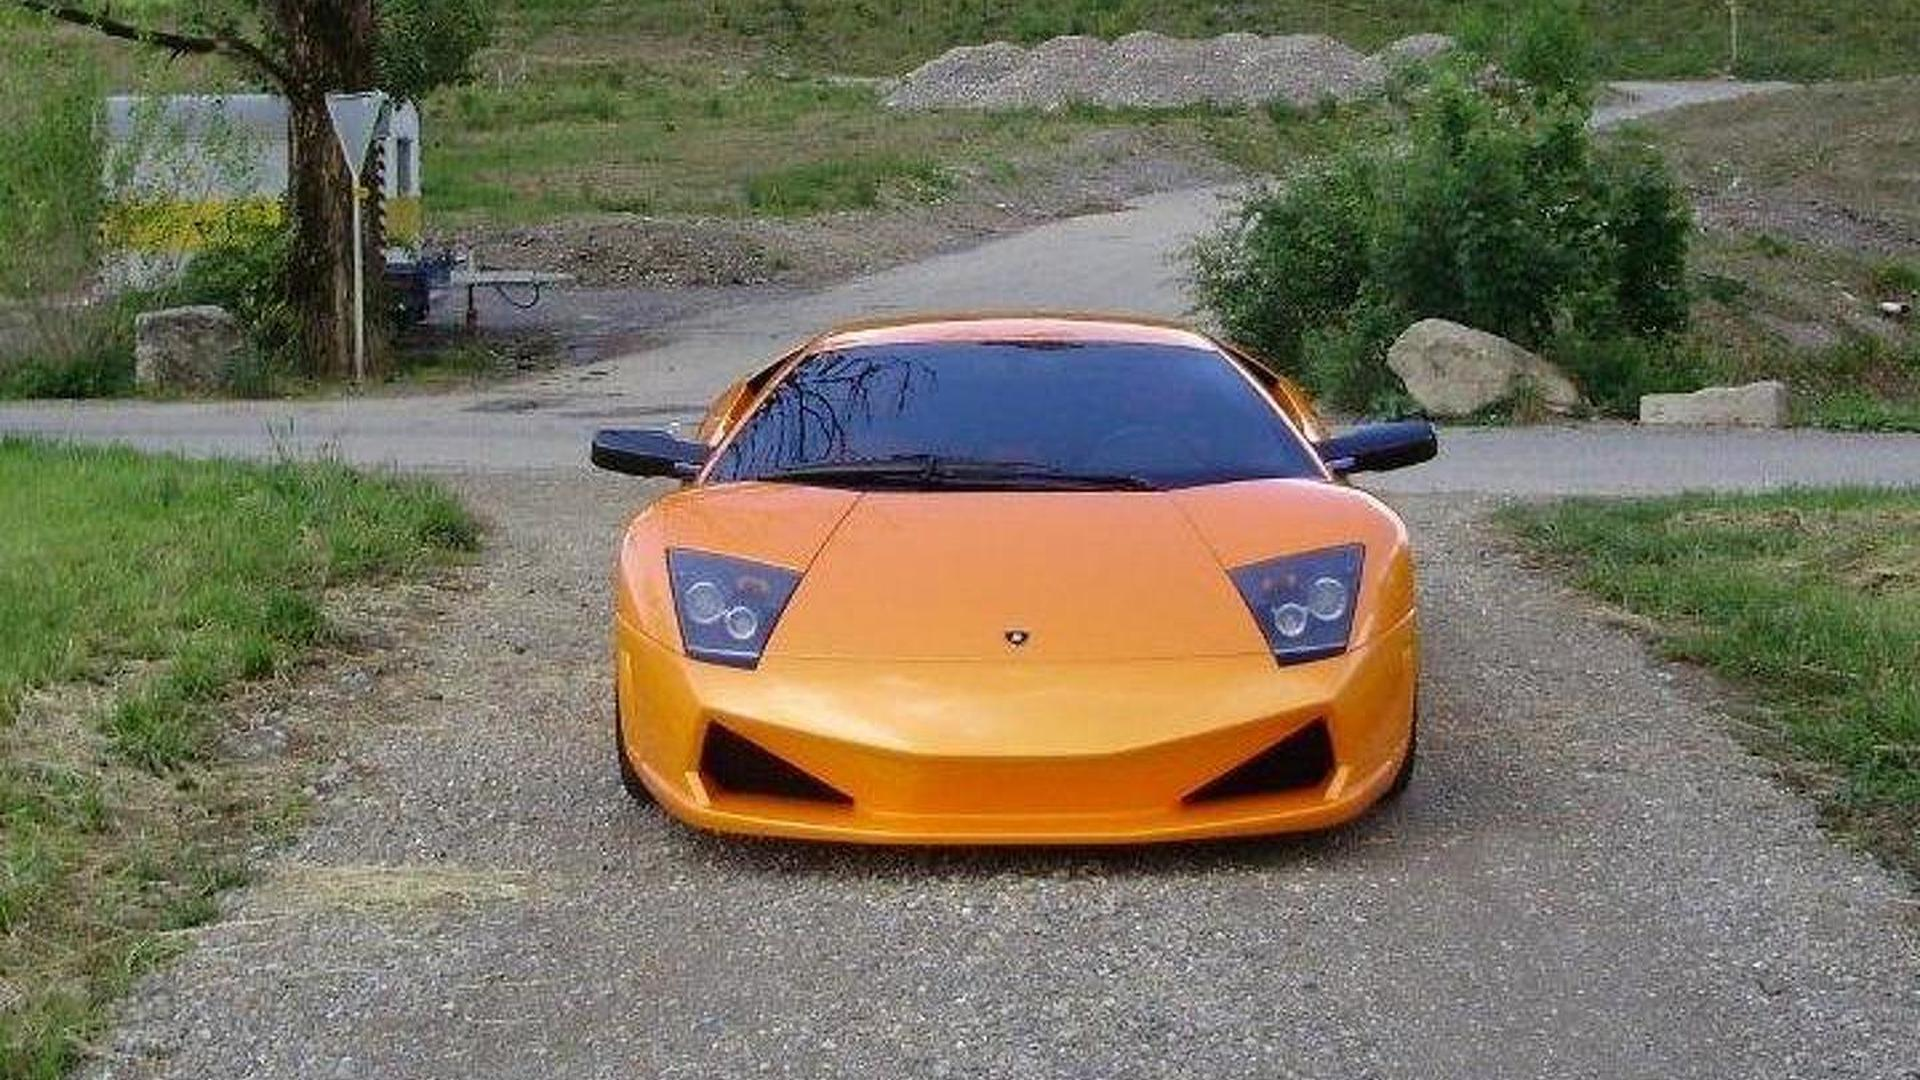 Lamborghini Murcielago Gt By Dmc